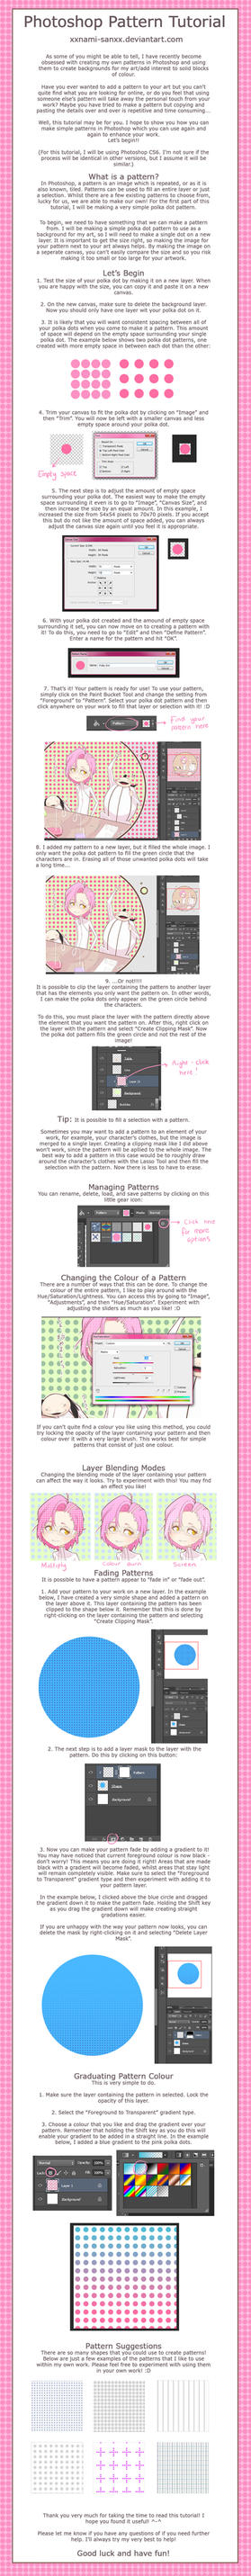 Nami's Photoshop Pattern Tutorial by Namiiru